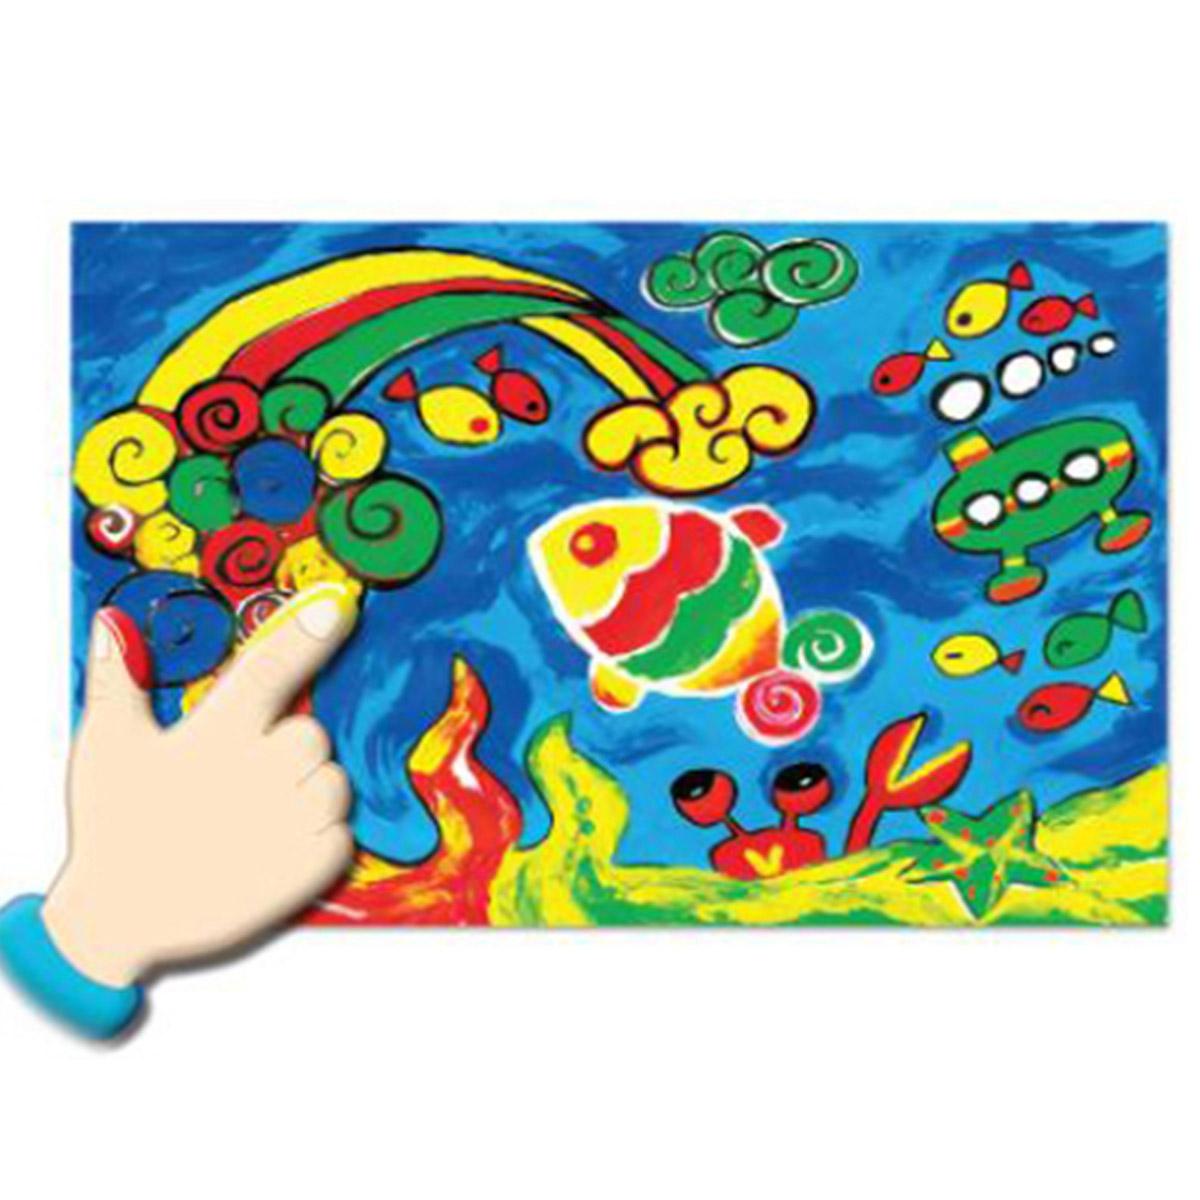 Details zu MUNGYO Finger Paint Water Color 100g x 8 Colors Kids Picture  Play Face Painting